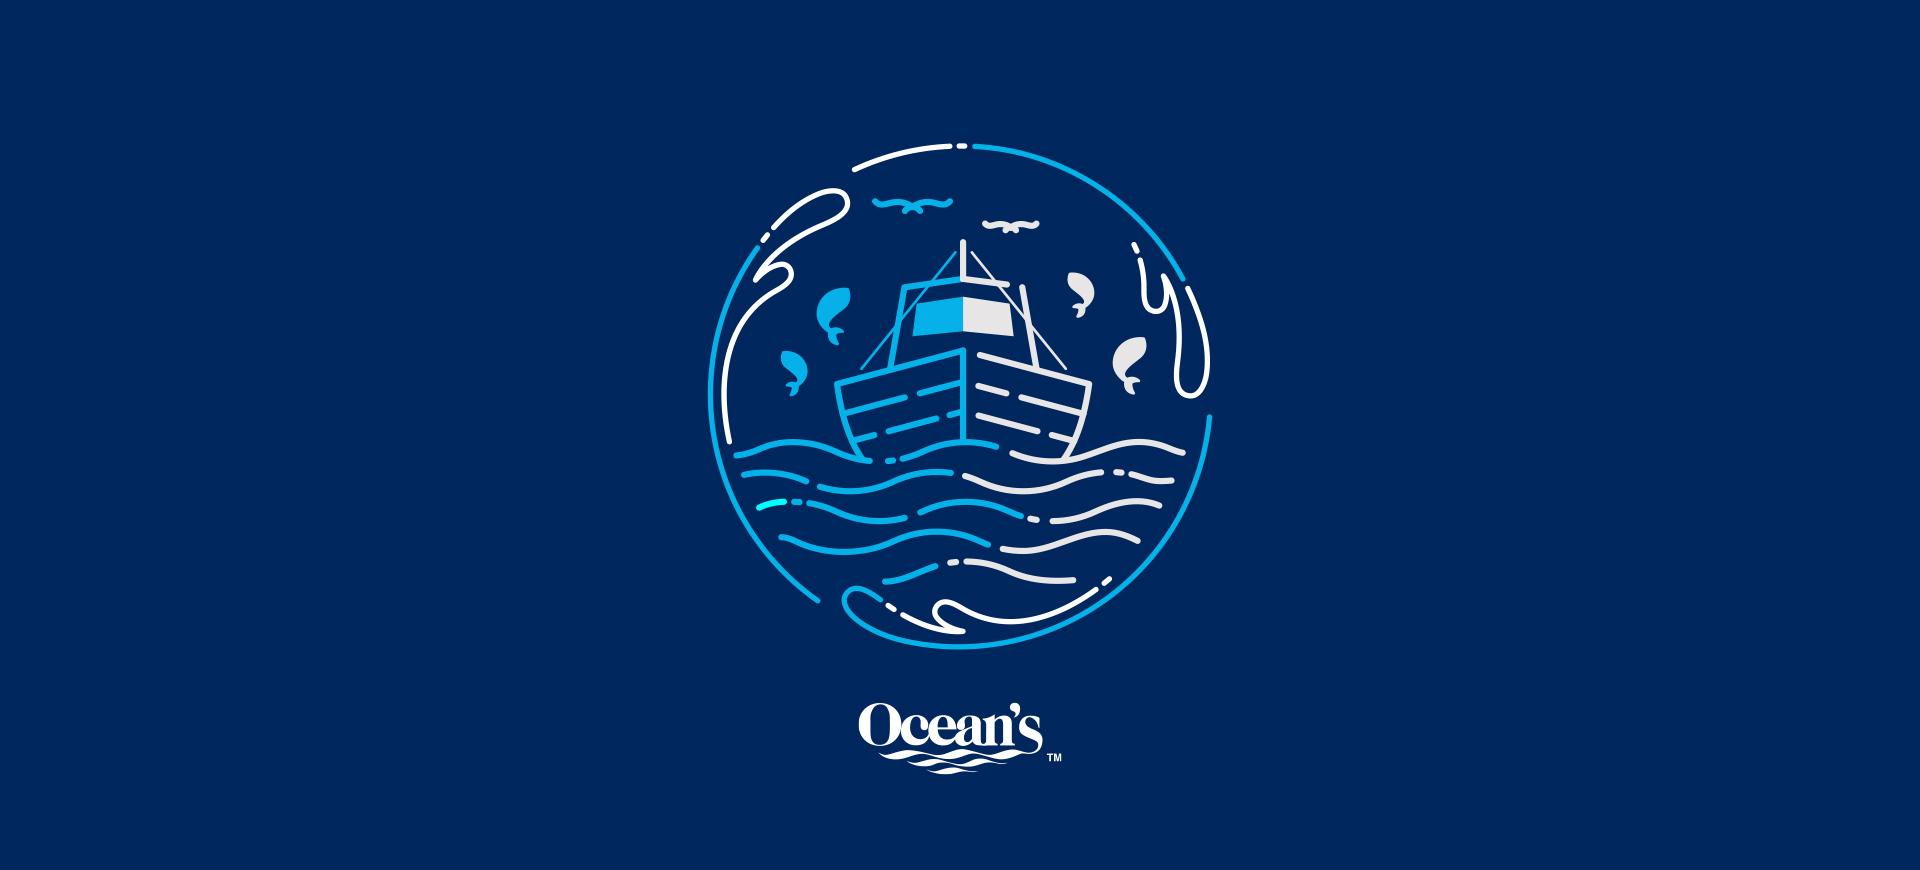 JUN25 OCEANS BLOG Web 1